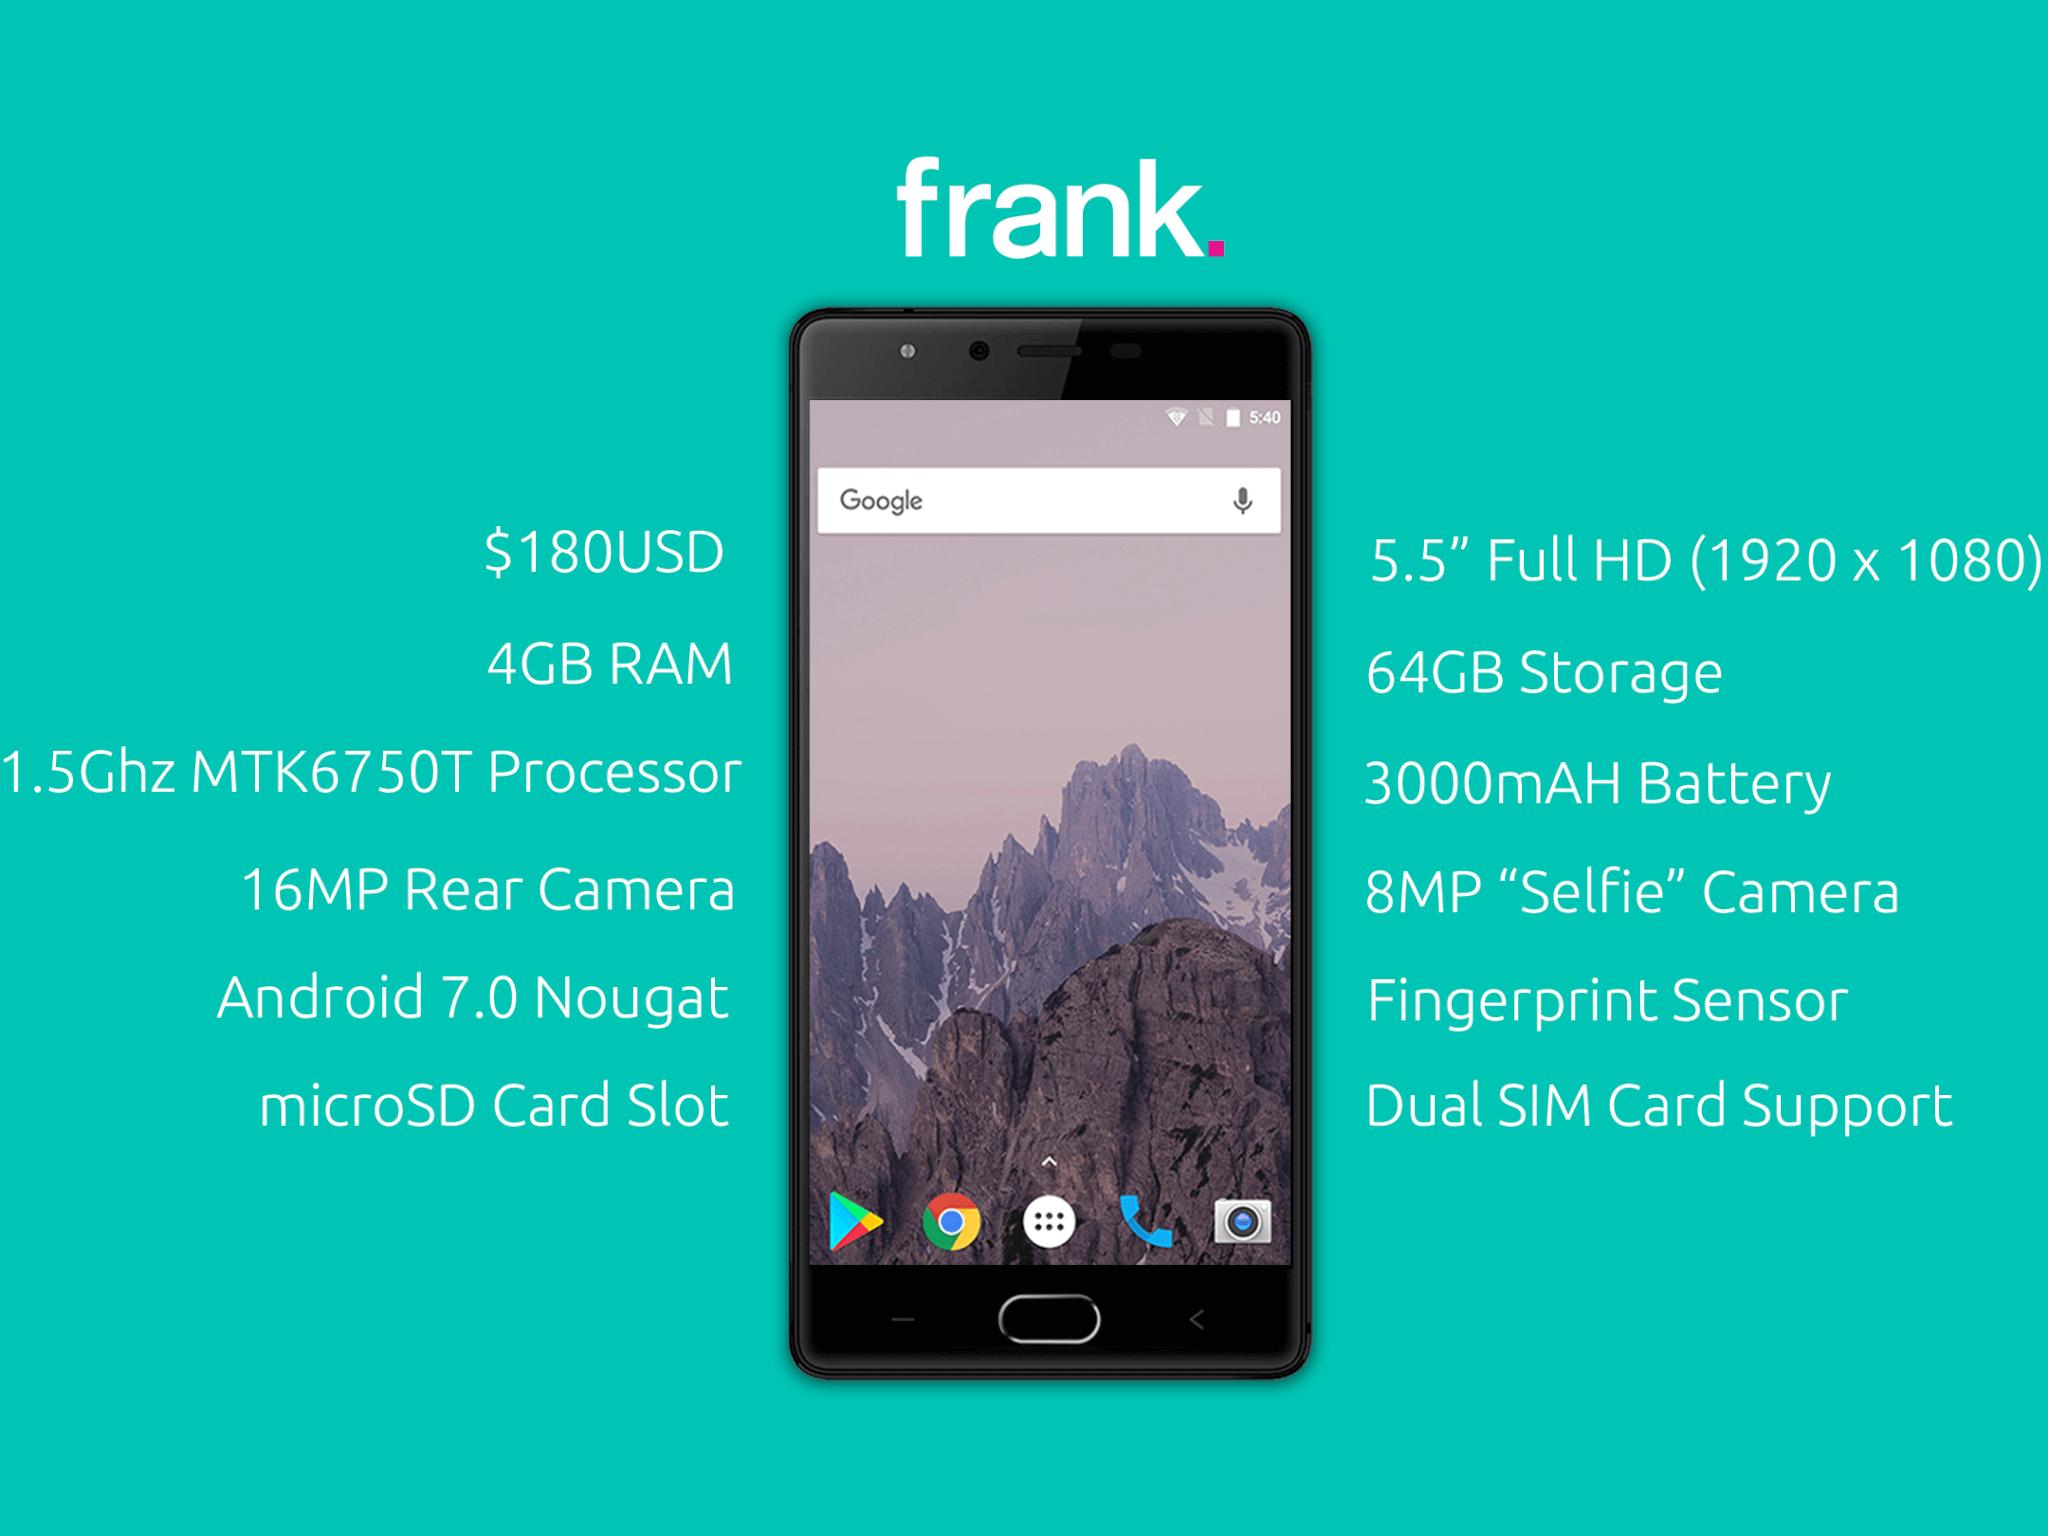 frank. specs